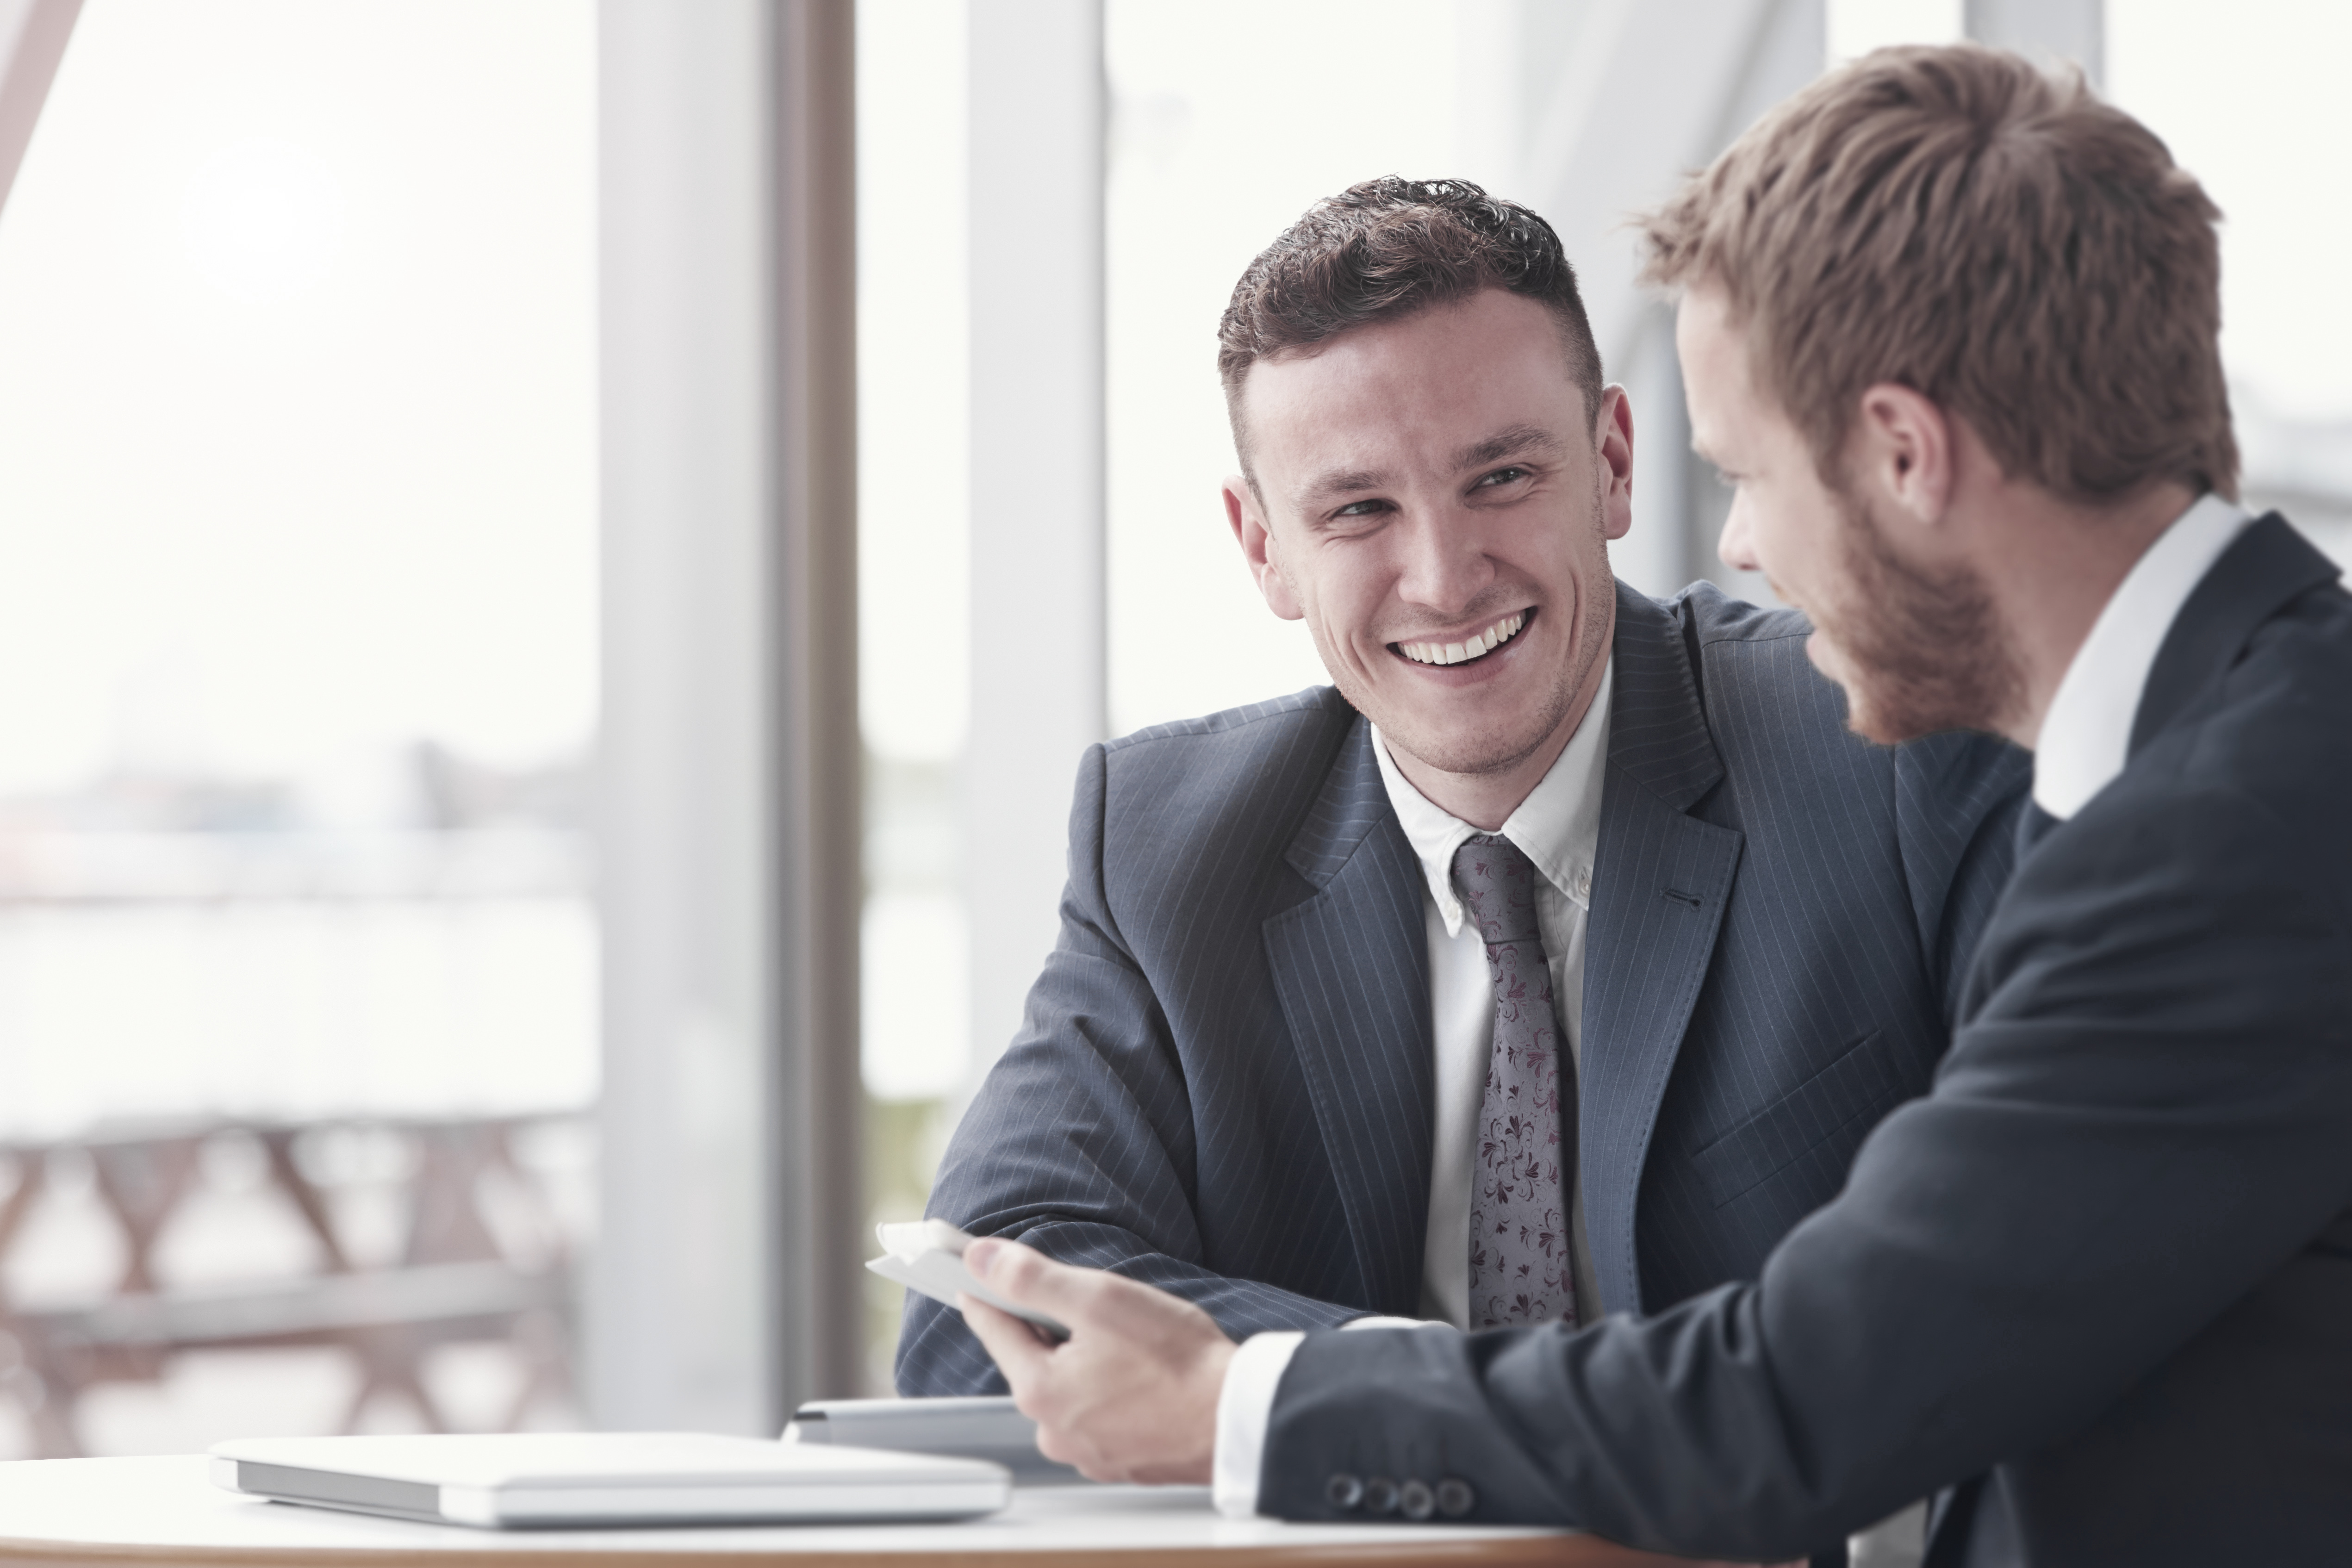 Businessmen smiling (4-3)